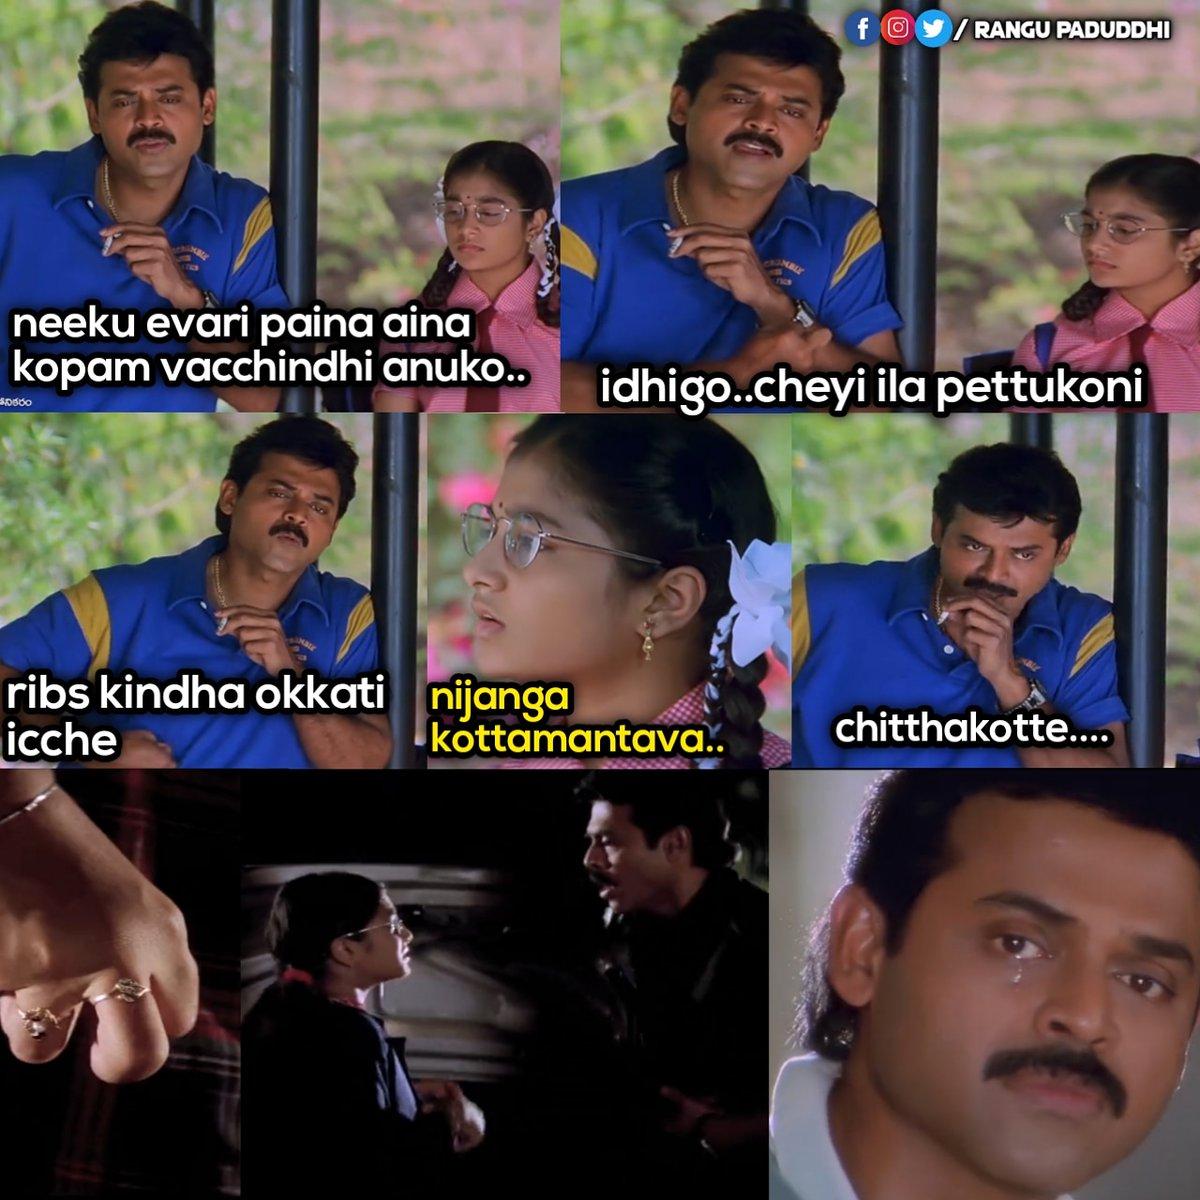 Venky: nenu Chala mosalu chesanu..ilantidhi eppudu cheyala For more fun Do follow - @rangu_paduddhi #rangupaduddhi #comedy #fun #memes #memesdaily #telugumemes #trolls #telugumeme #telugucomedy  #babunuvvubtechah #btechlife #btechjokes  #memes#memers #Venkateshdaggubatipic.twitter.com/WADFTtMtA8